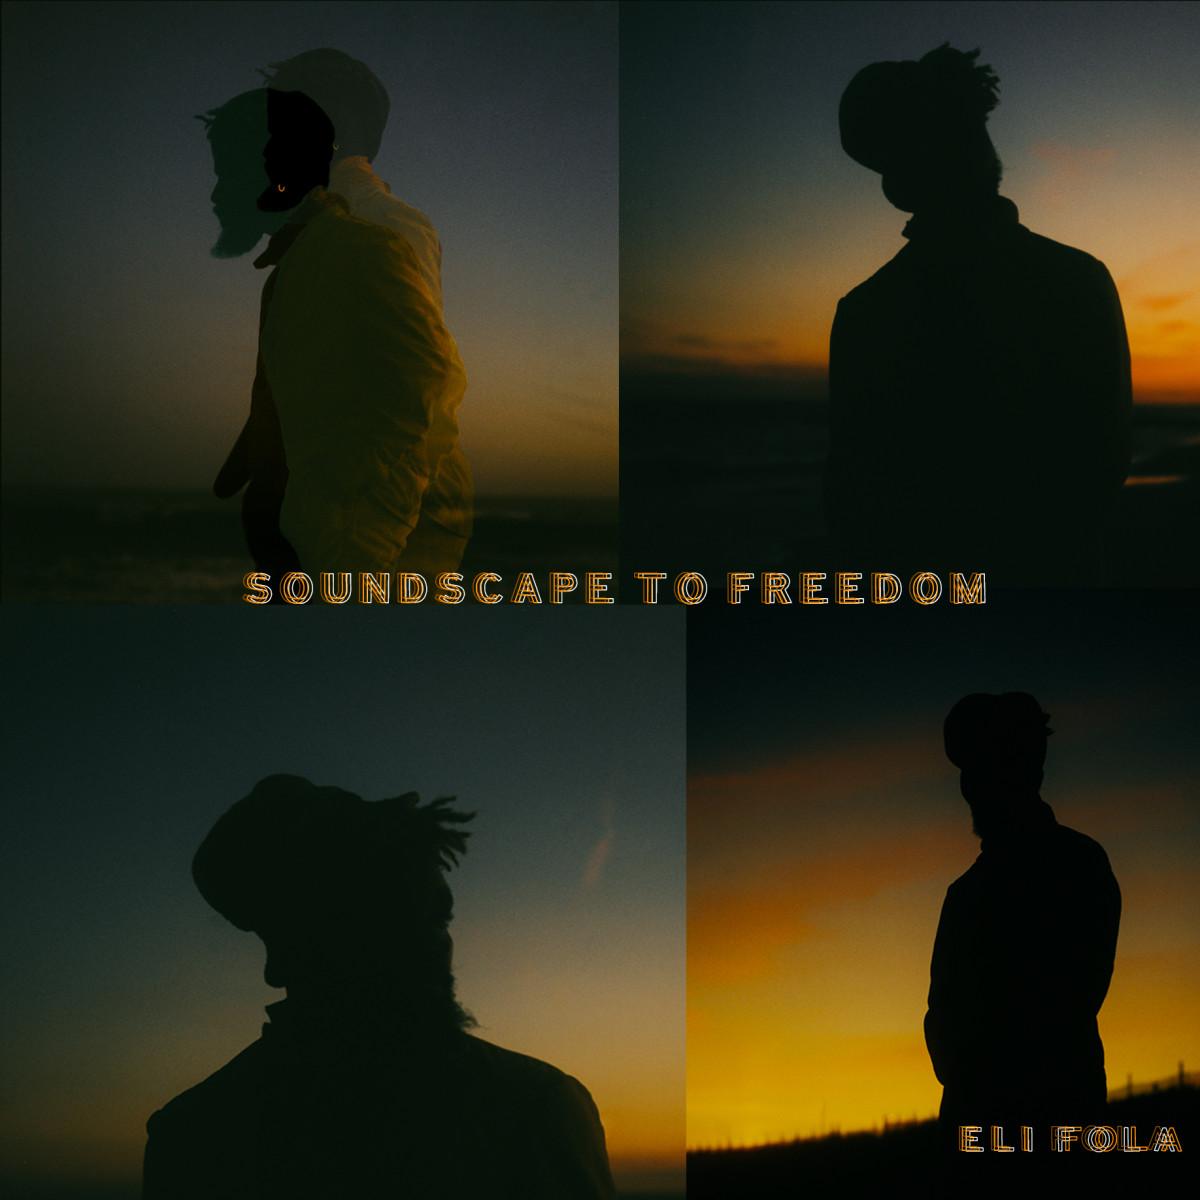 Eli Fola Soundscape To Freedom